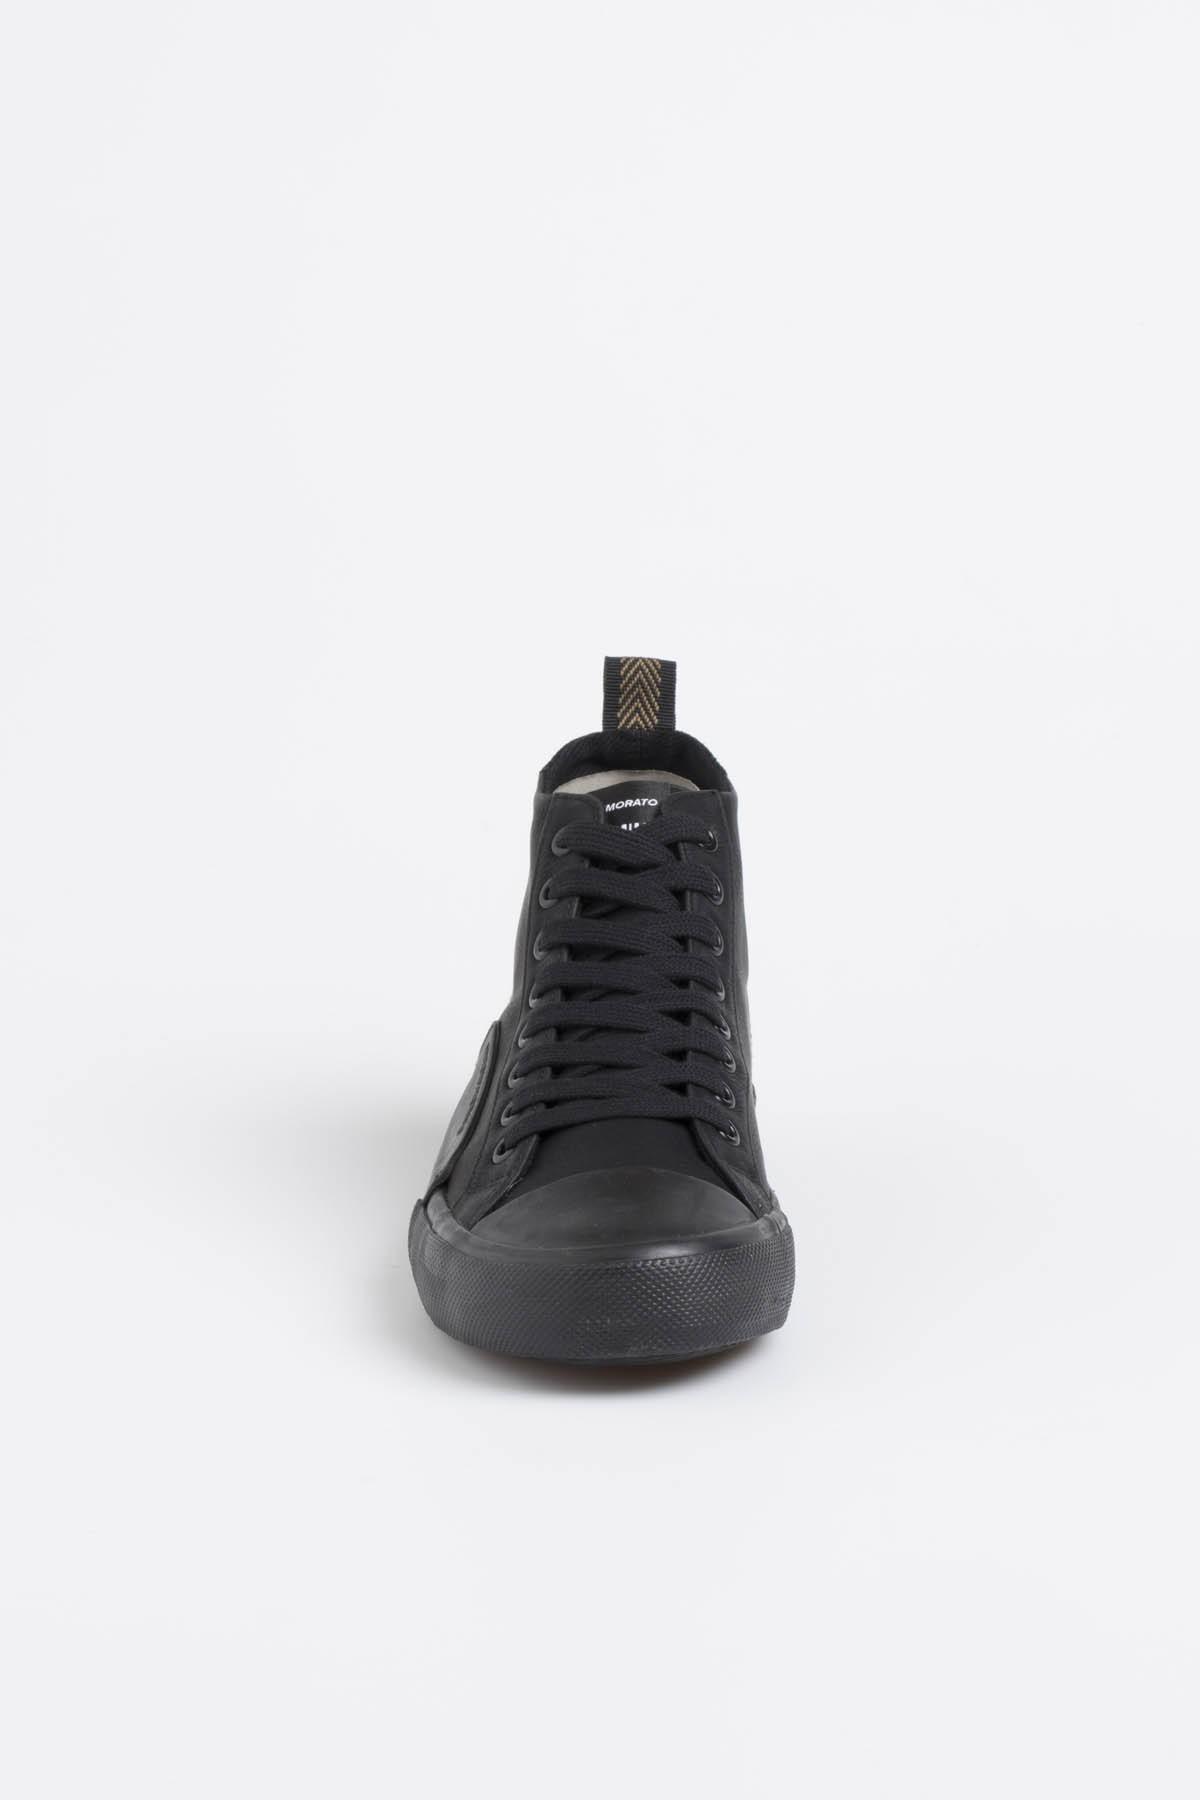 Schuhe für Männer NUBUK-OPTIK ANTONY MORATO A/I 18-19